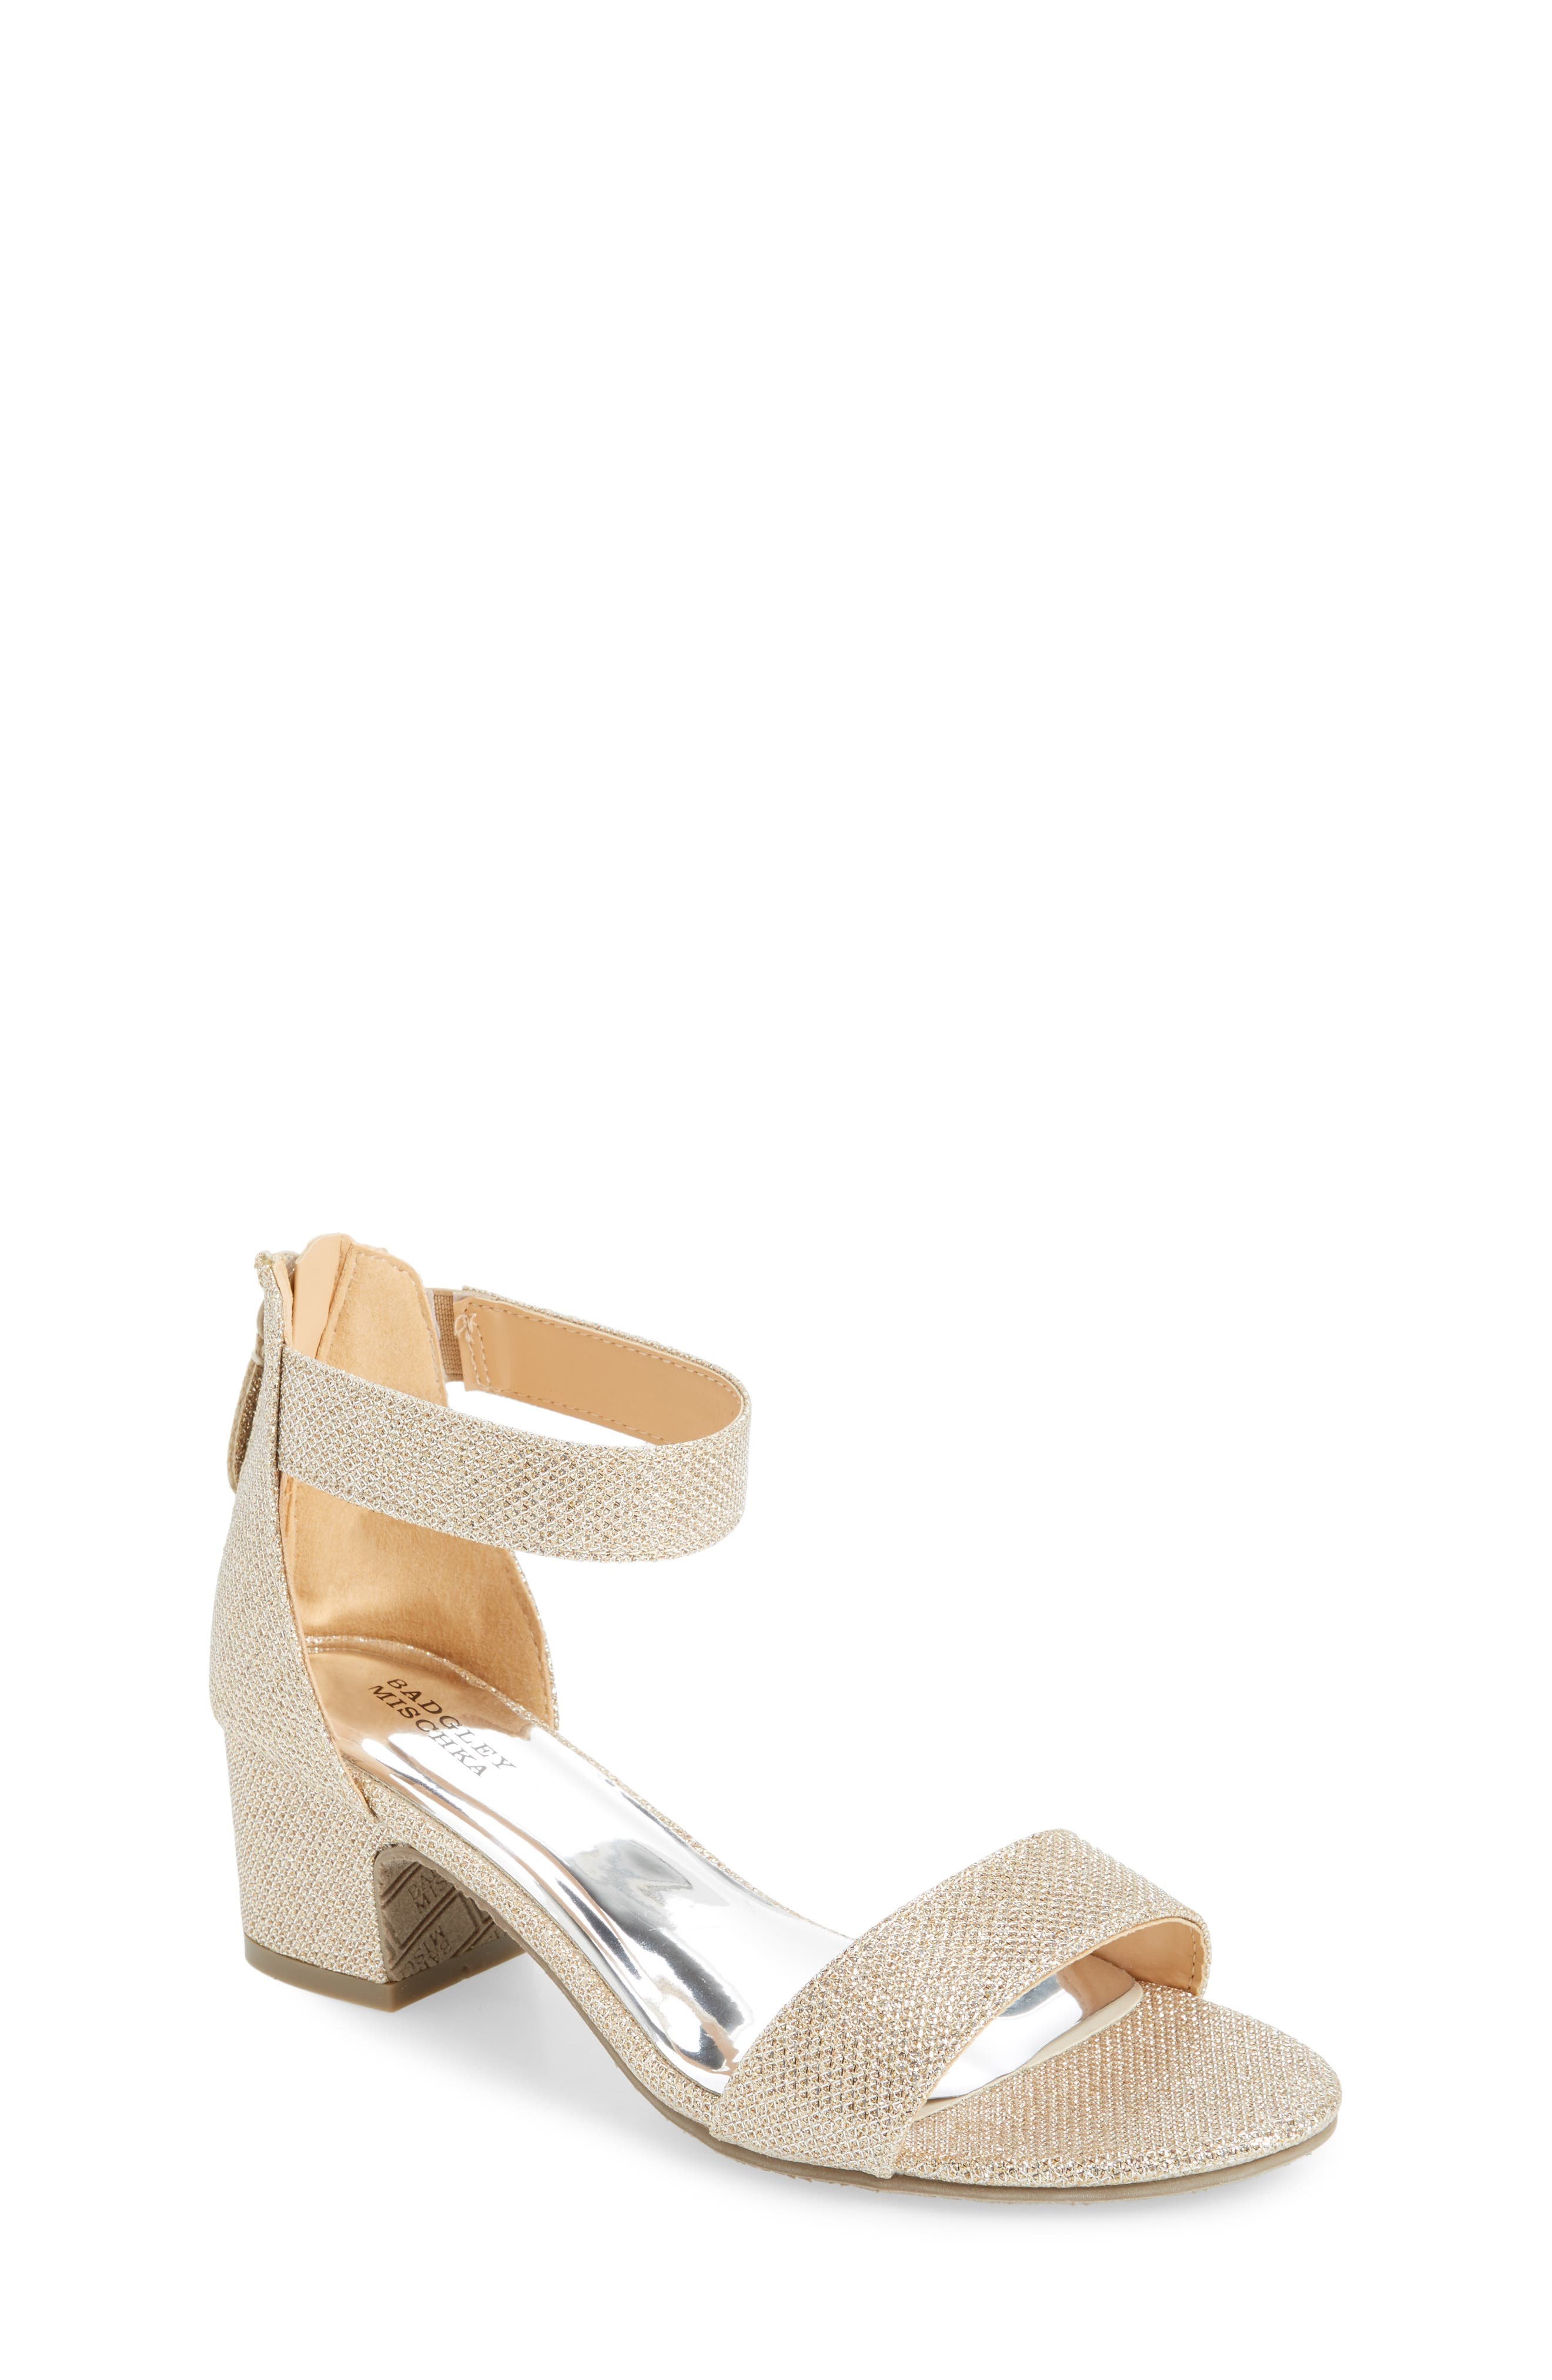 BADGLEY MISCHKA COLLECTION Badgley Mischka Pernia Velma Shimmer Sandal, Main, color, LIGHT GOLD SHIMMER